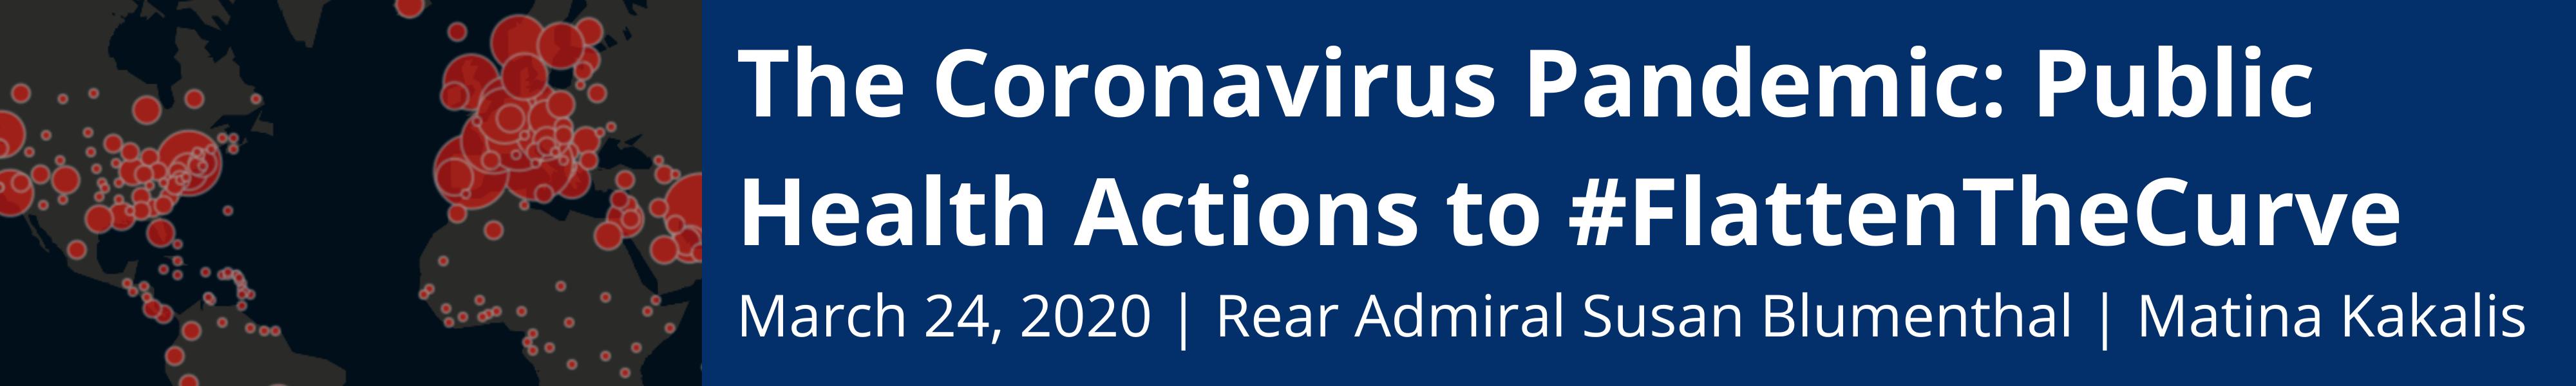 The Coronavirus Pandemic: Public Health Actions to #FlattenTheCurve